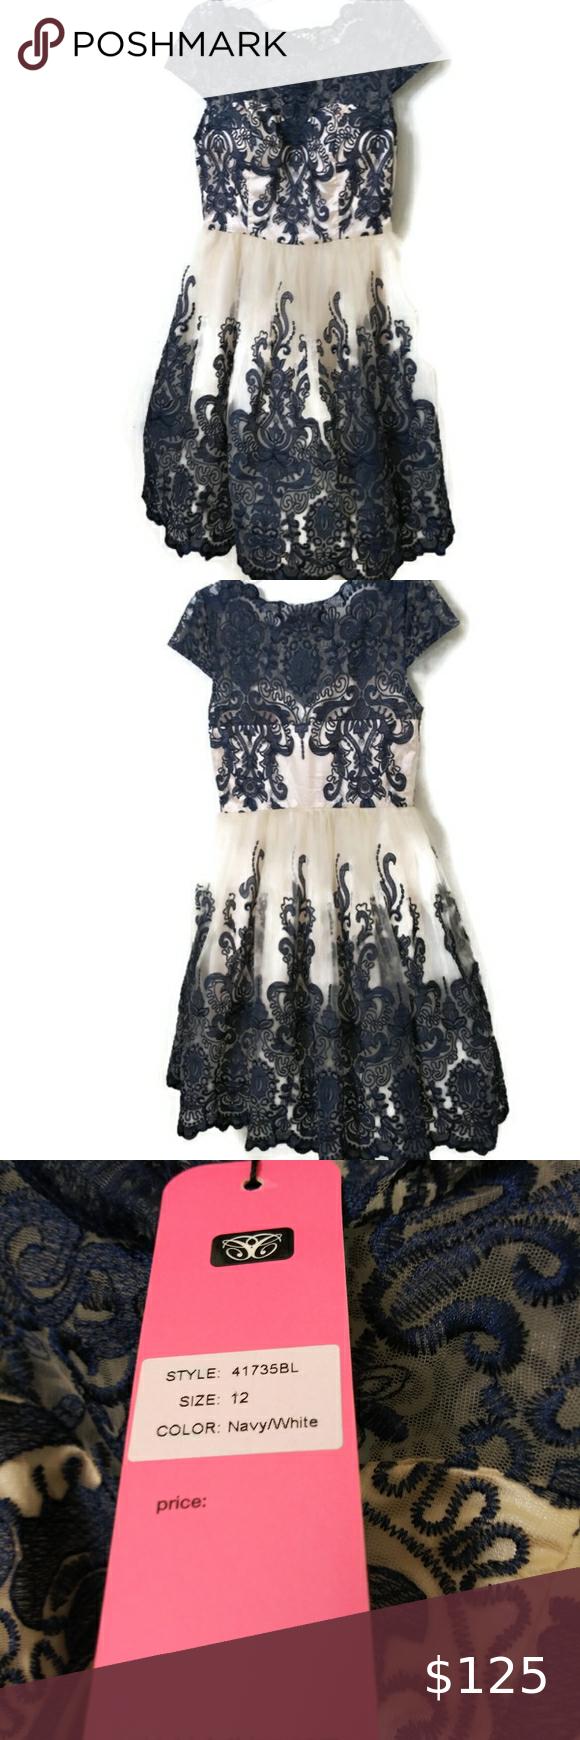 Chi Chi London Exquisite Elegance Lace Dress  12 Chi Chi London dress Size 12. C…